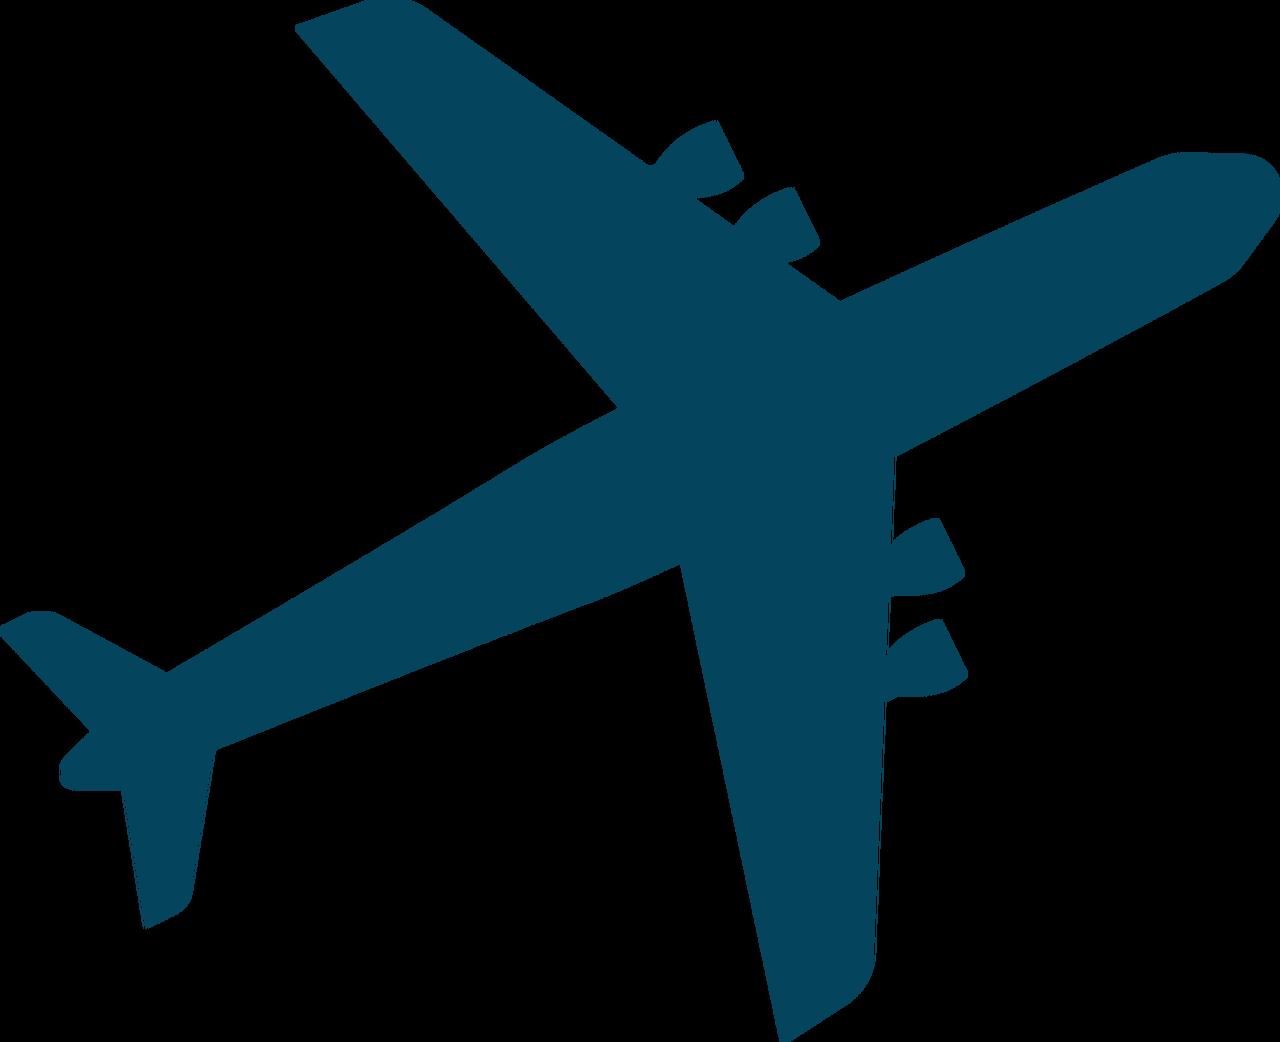 Airplane #5 SVG Cut File